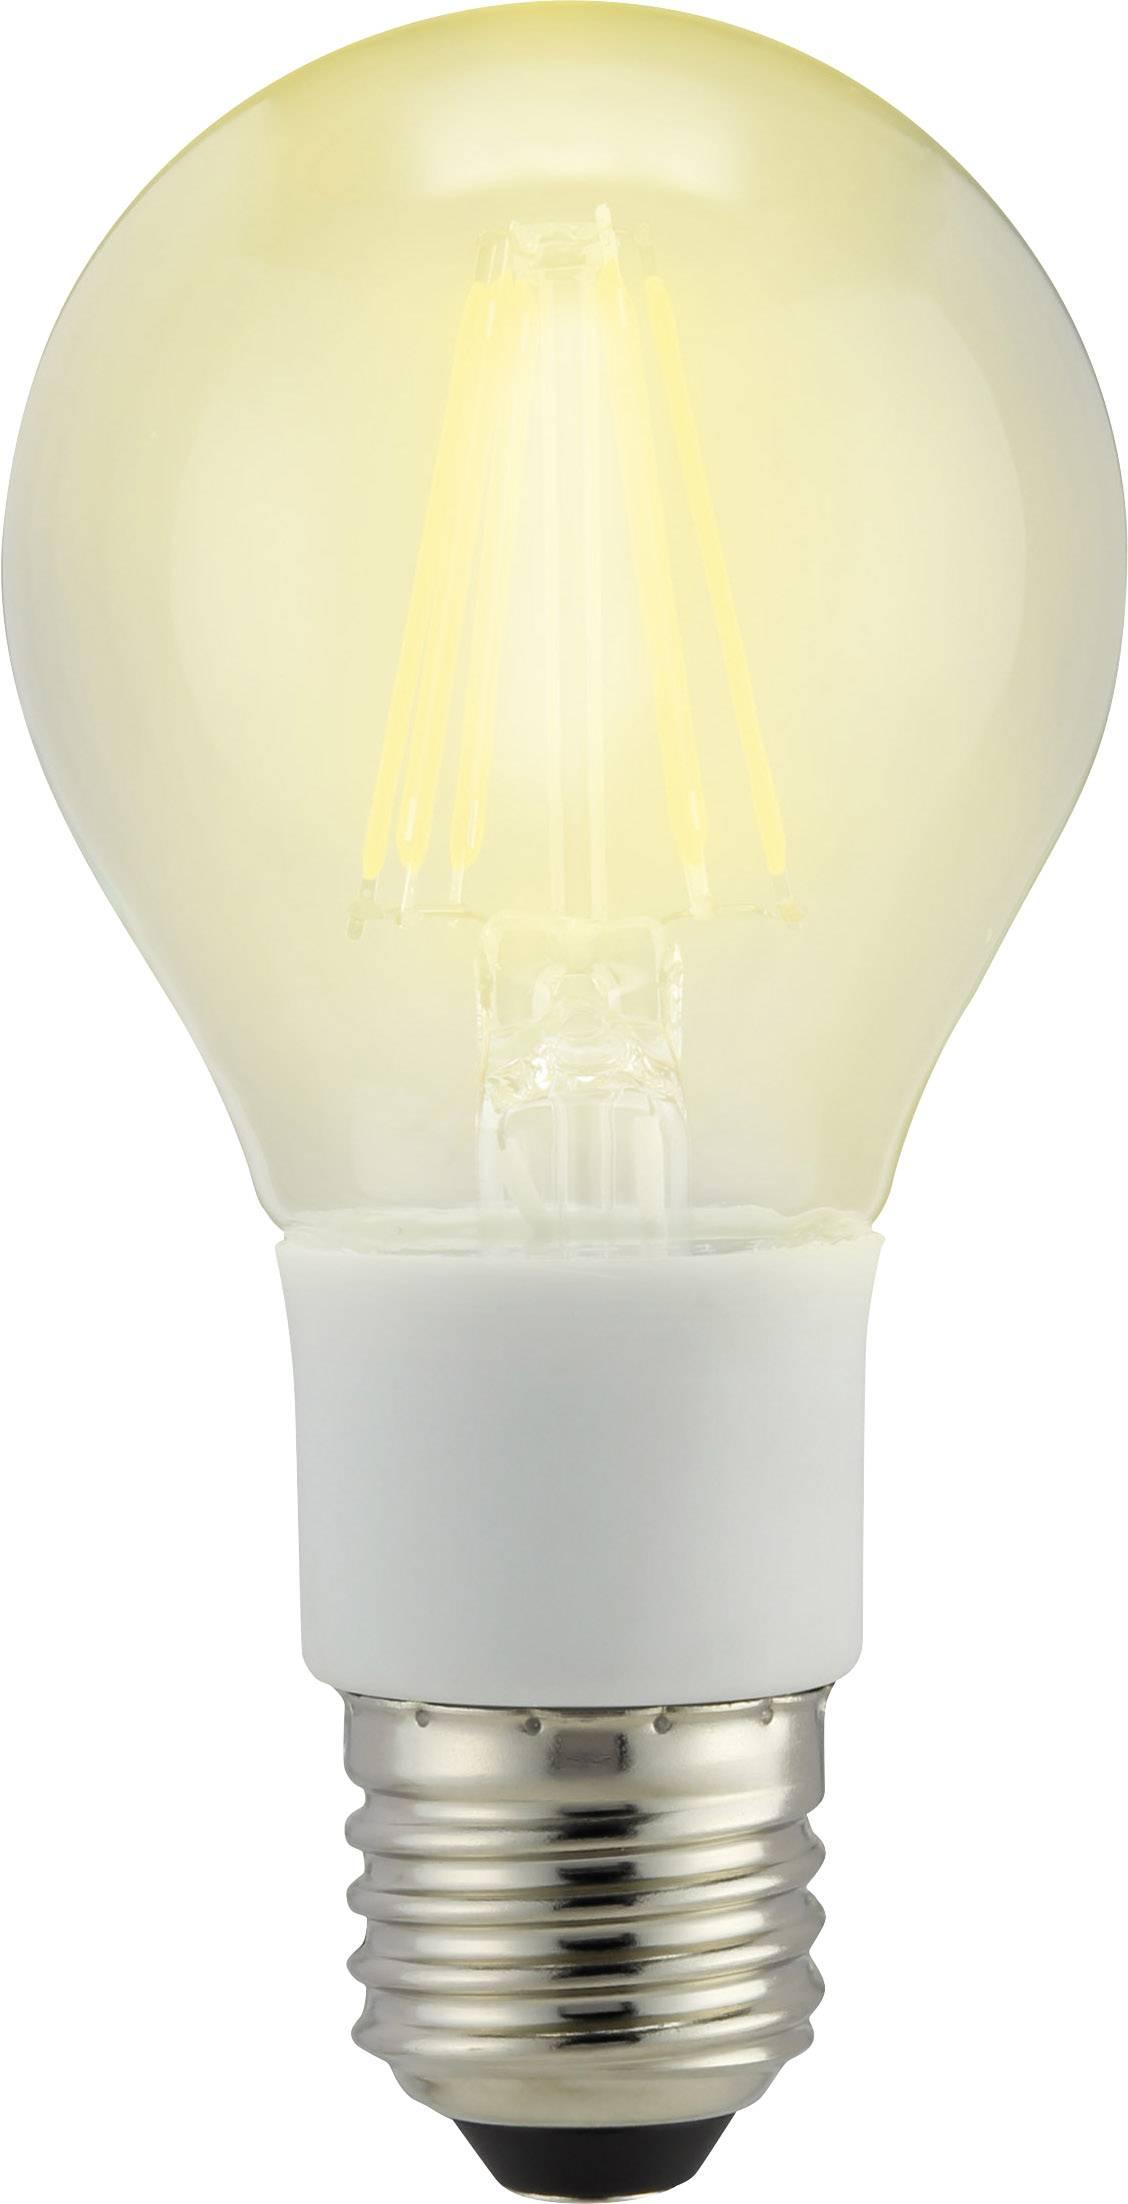 LED žárovka Sygonix STA6043 230 V, E27, 7 W = 60 W, teplá bílá, A++, vlákno, stmívatelná, 1 ks